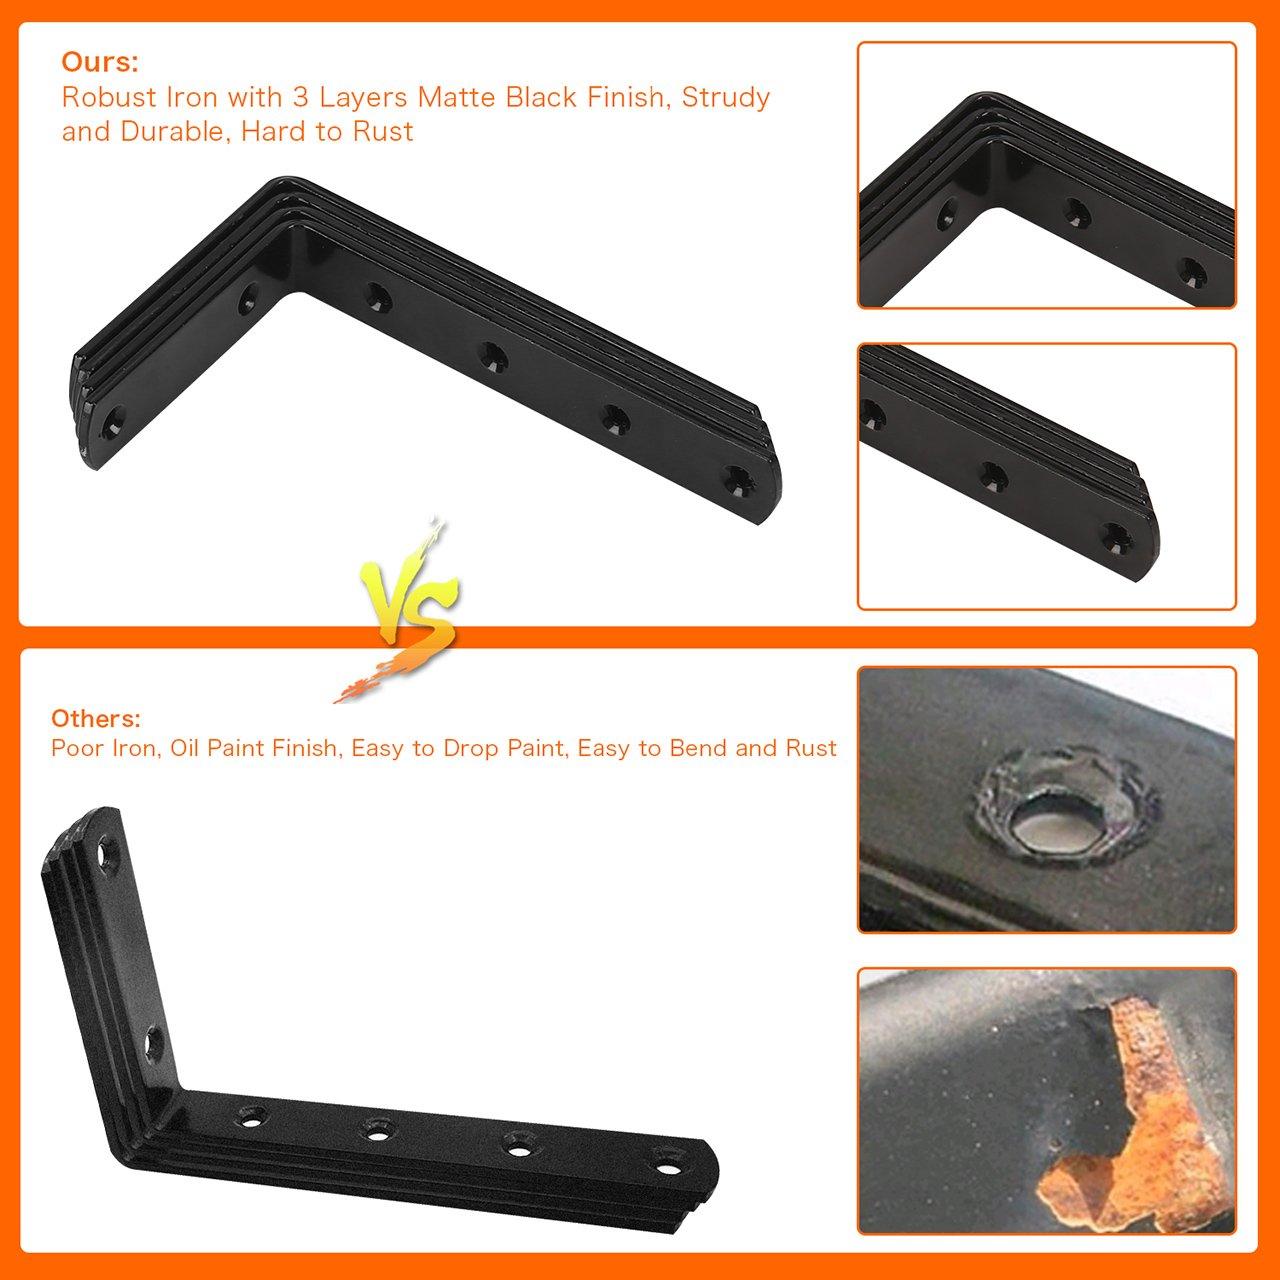 FlexDin 4Pcs Metal Heavy Duty L Corner Brace Joint Angle Bracket Shelf Brackets Wall Decorative Corner Brackets 3 x 5 in Matte Black and 4Pcs Multifunctional S Hooks Hanging System